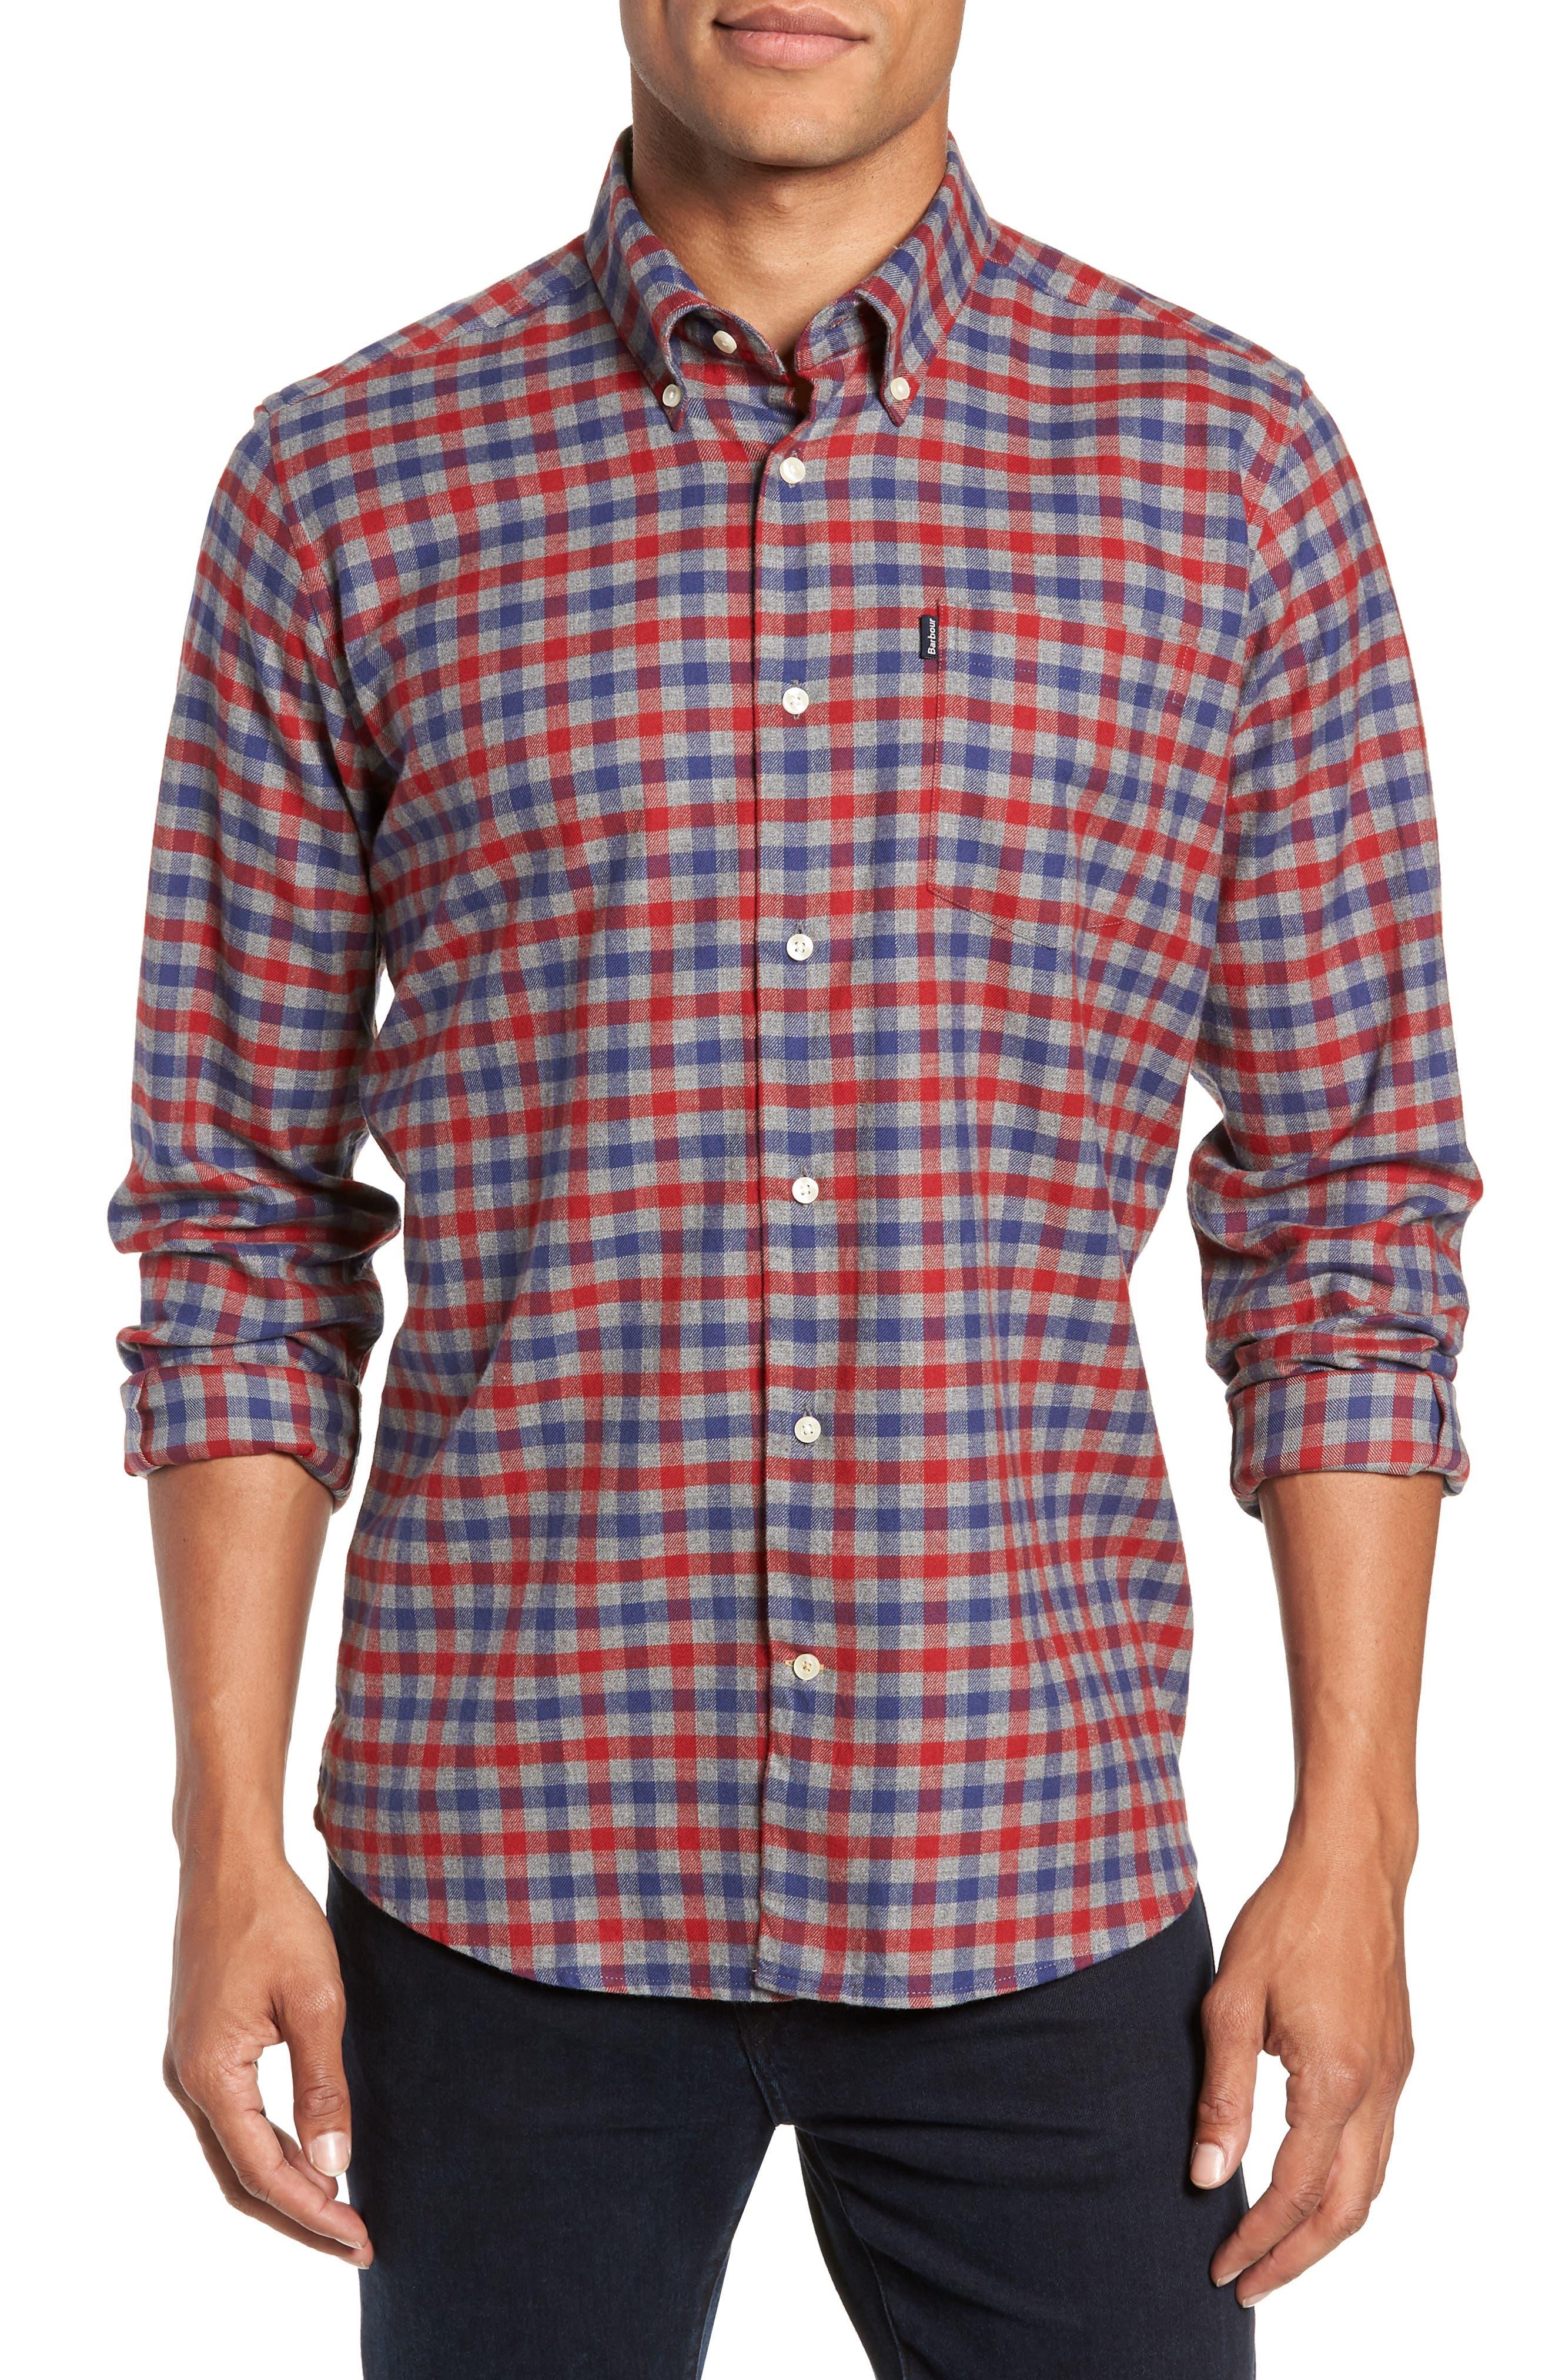 Moss Check Flannel Sport Shirt,                             Main thumbnail 1, color,                             630